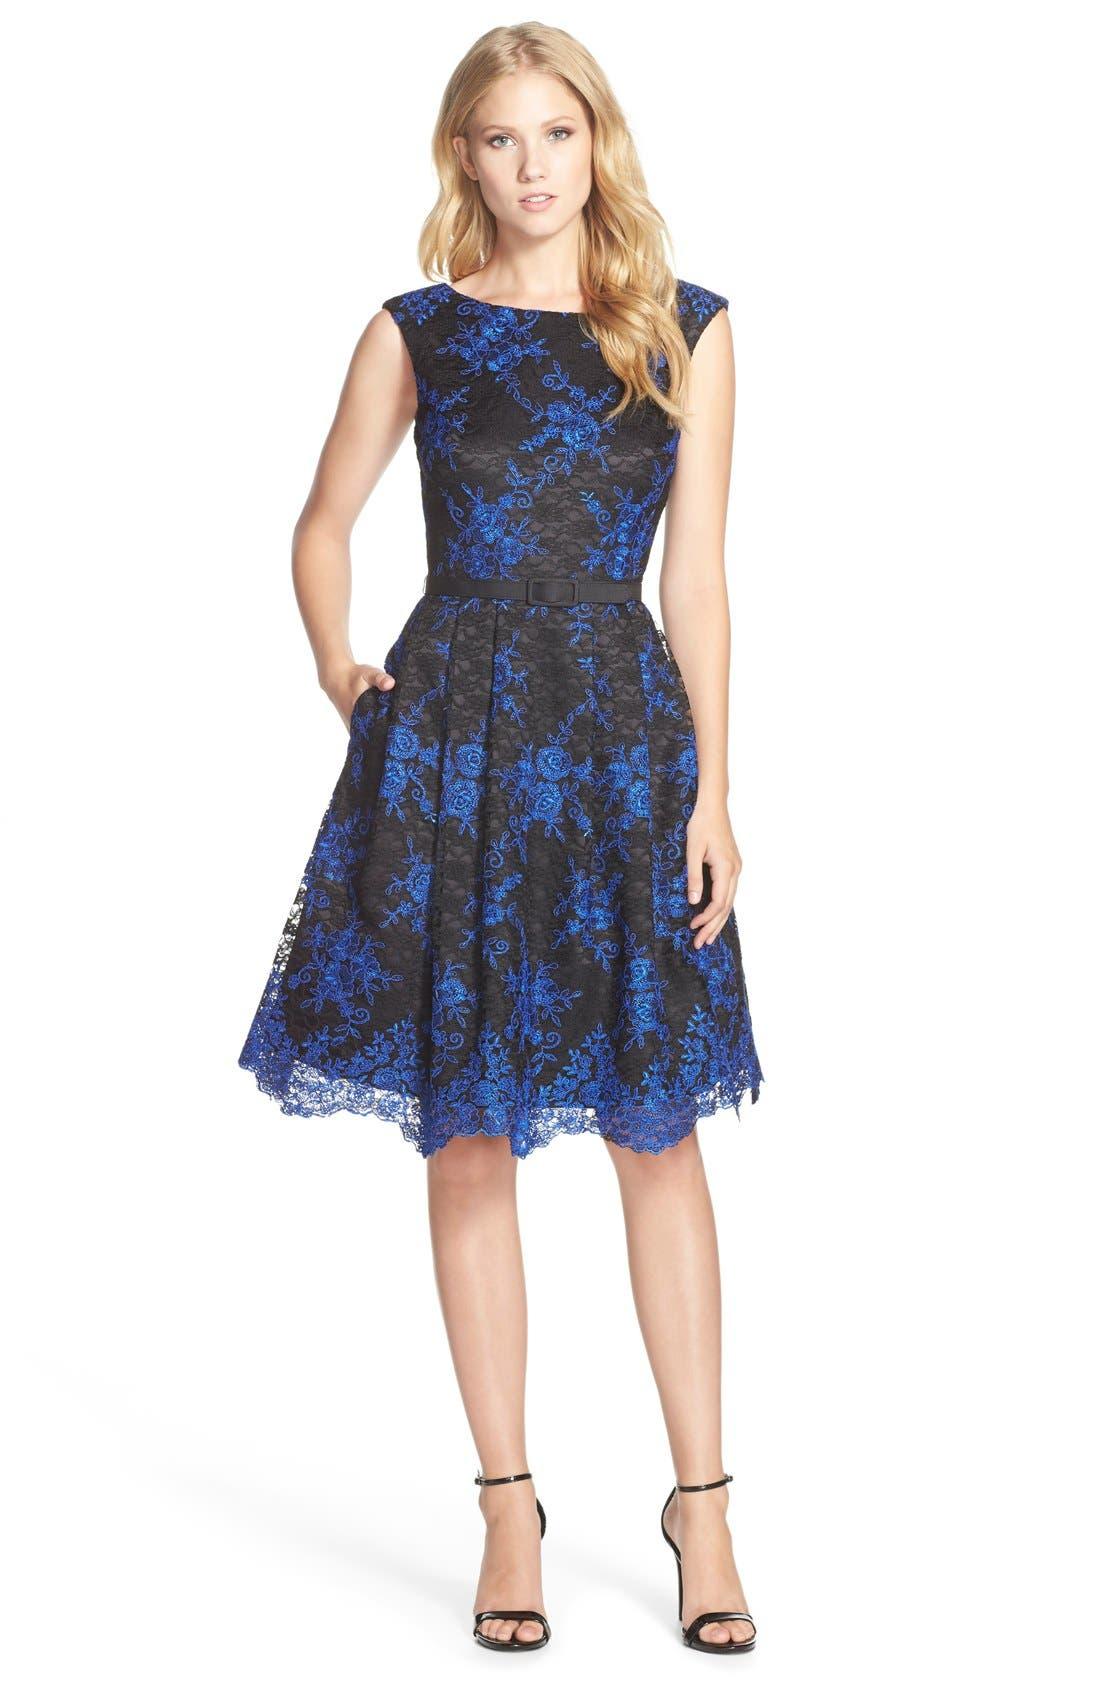 Main Image - Eliza J Belted Embroidered Lace Fit & Flare Dress (Regular & Petite)